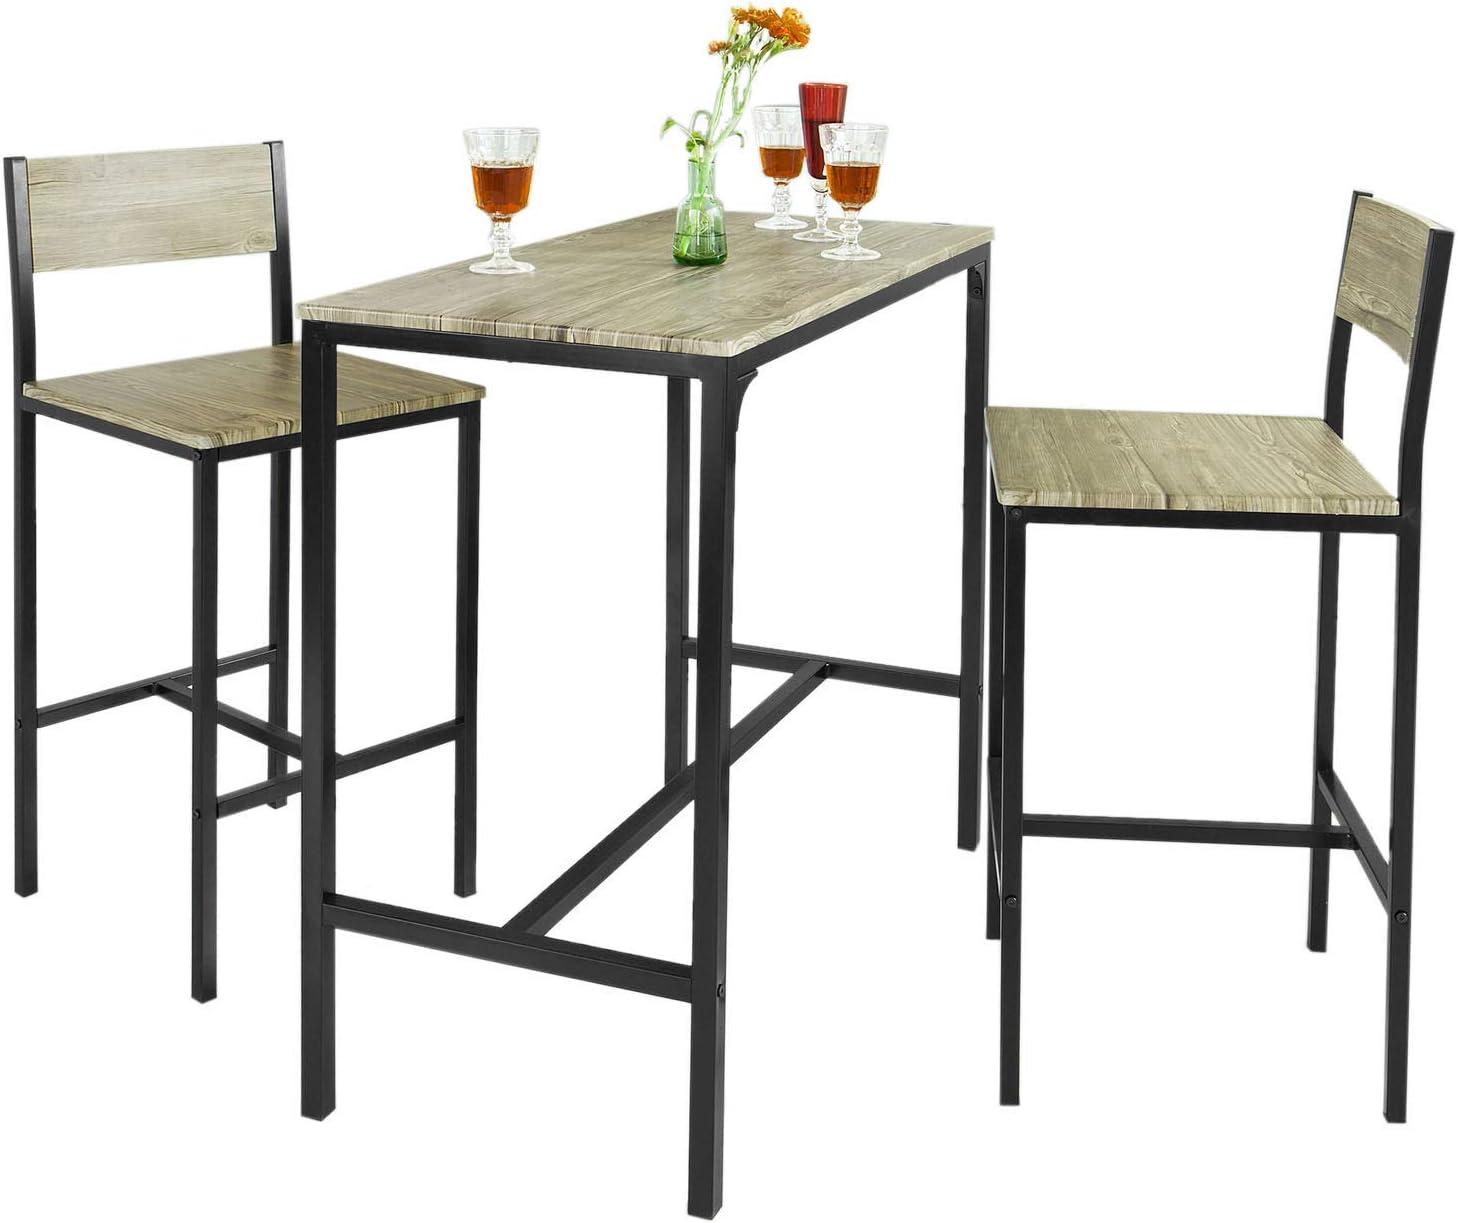 Sobuy Ogt03 Bar Set 1 Bar Table And 2 Stools Home Kitchen Restaurant Bar Set Furniture Dining Set Amazon Ca Home Kitchen